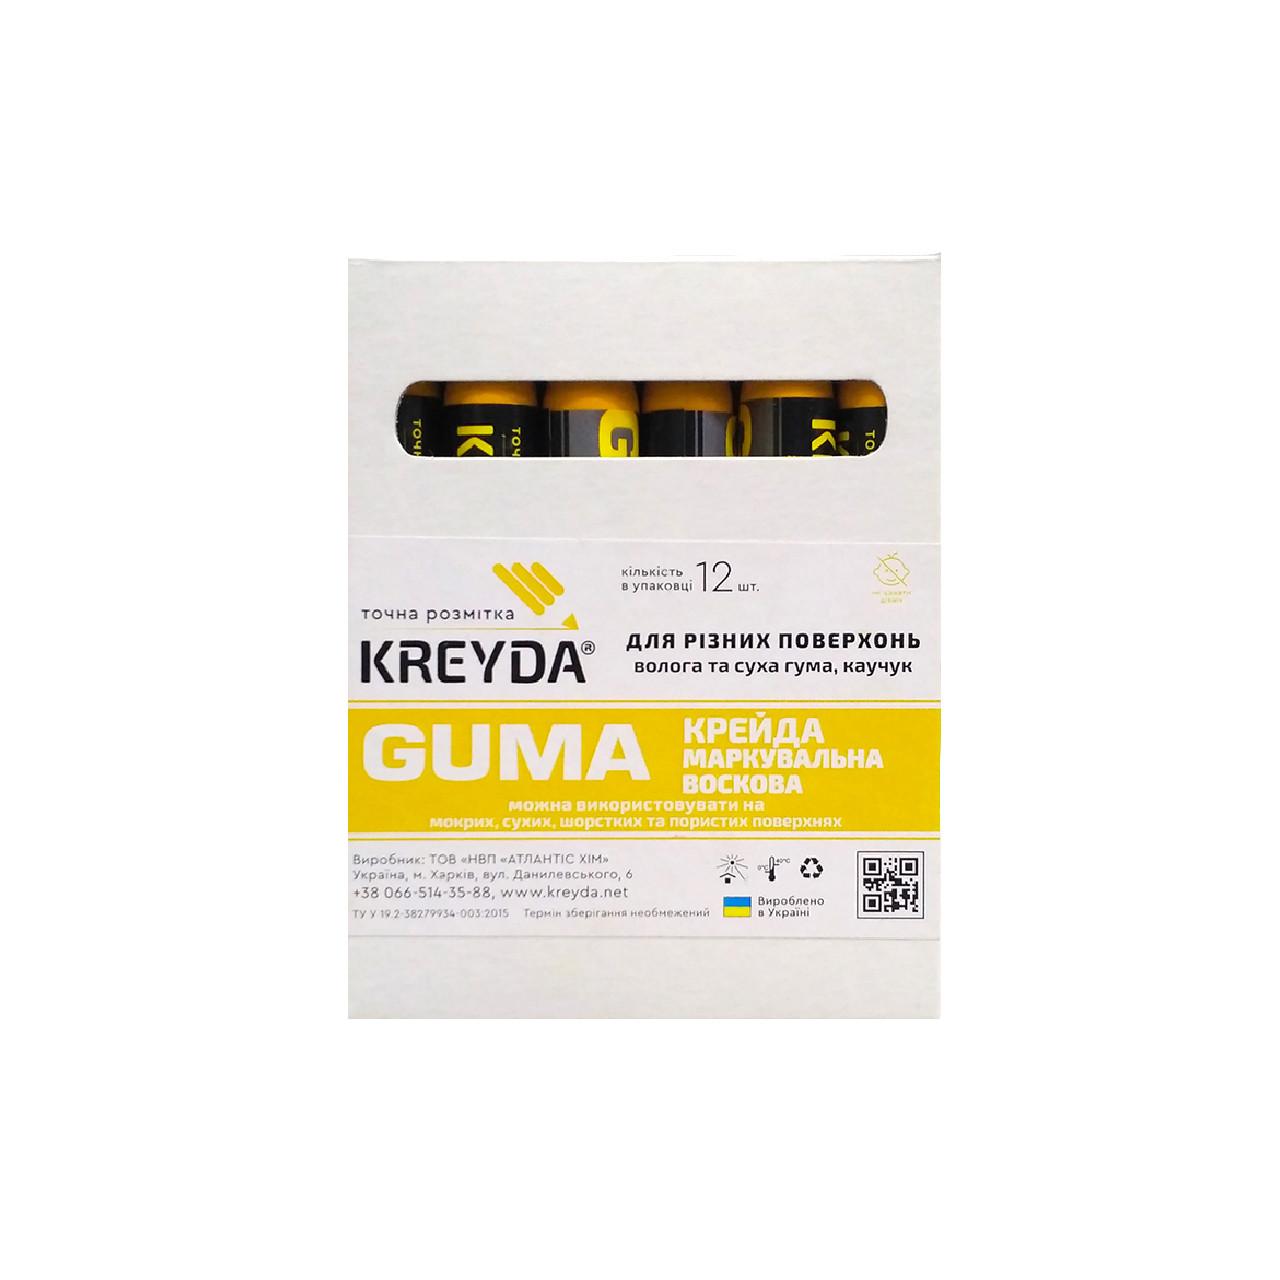 Воскова крейда для шиномонтажу (жовта) GUMA